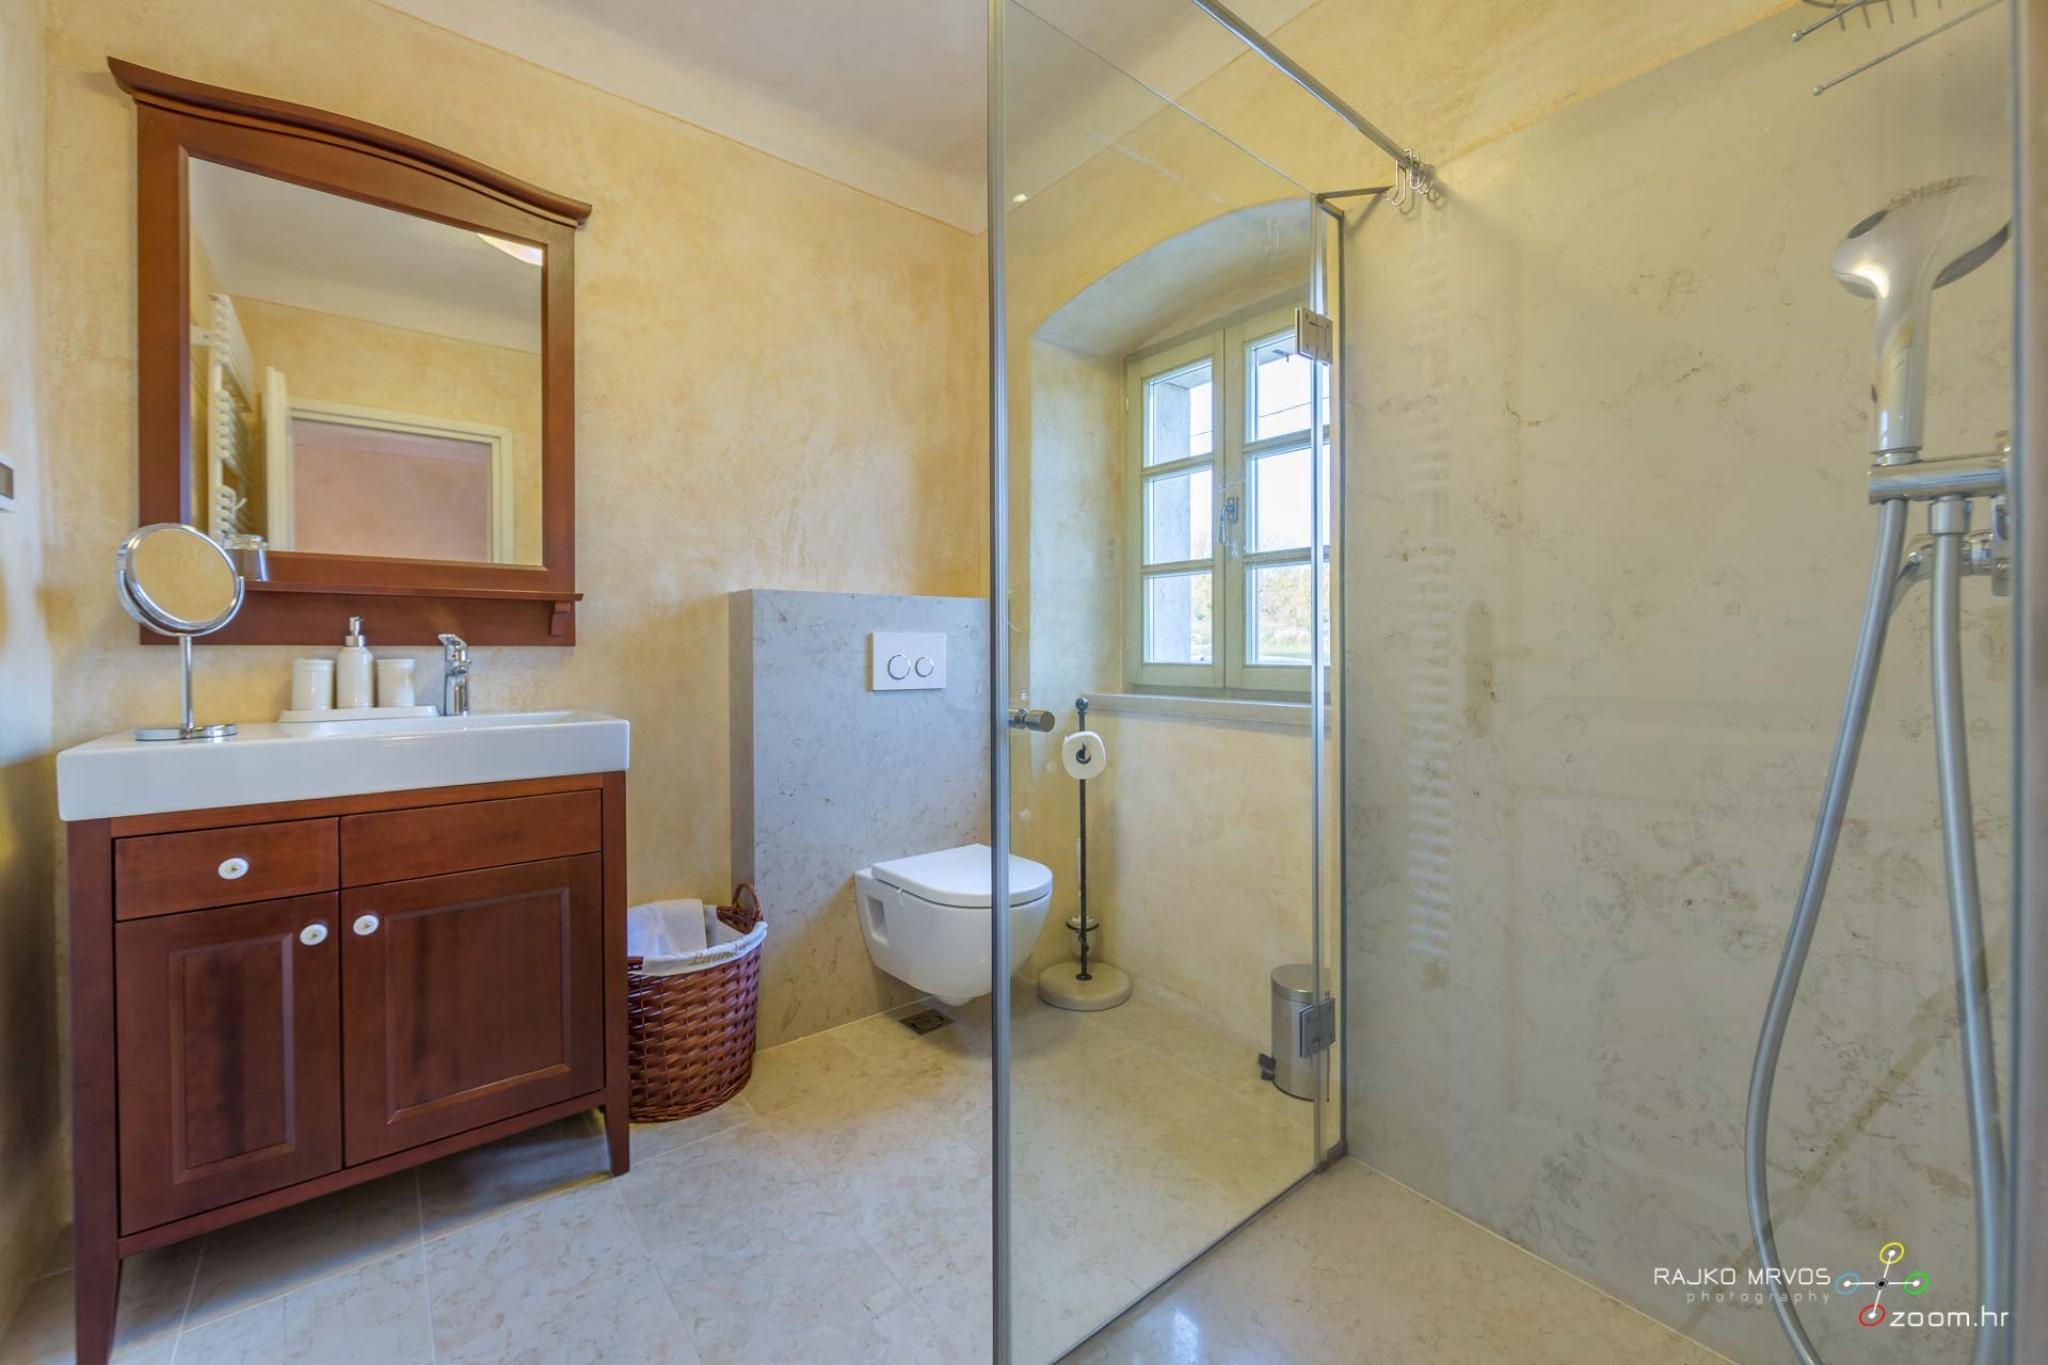 fotografiranje-interijera-fotograf-eksterijera-vila-kuca-apartmana-hotela-villa-Tona-89